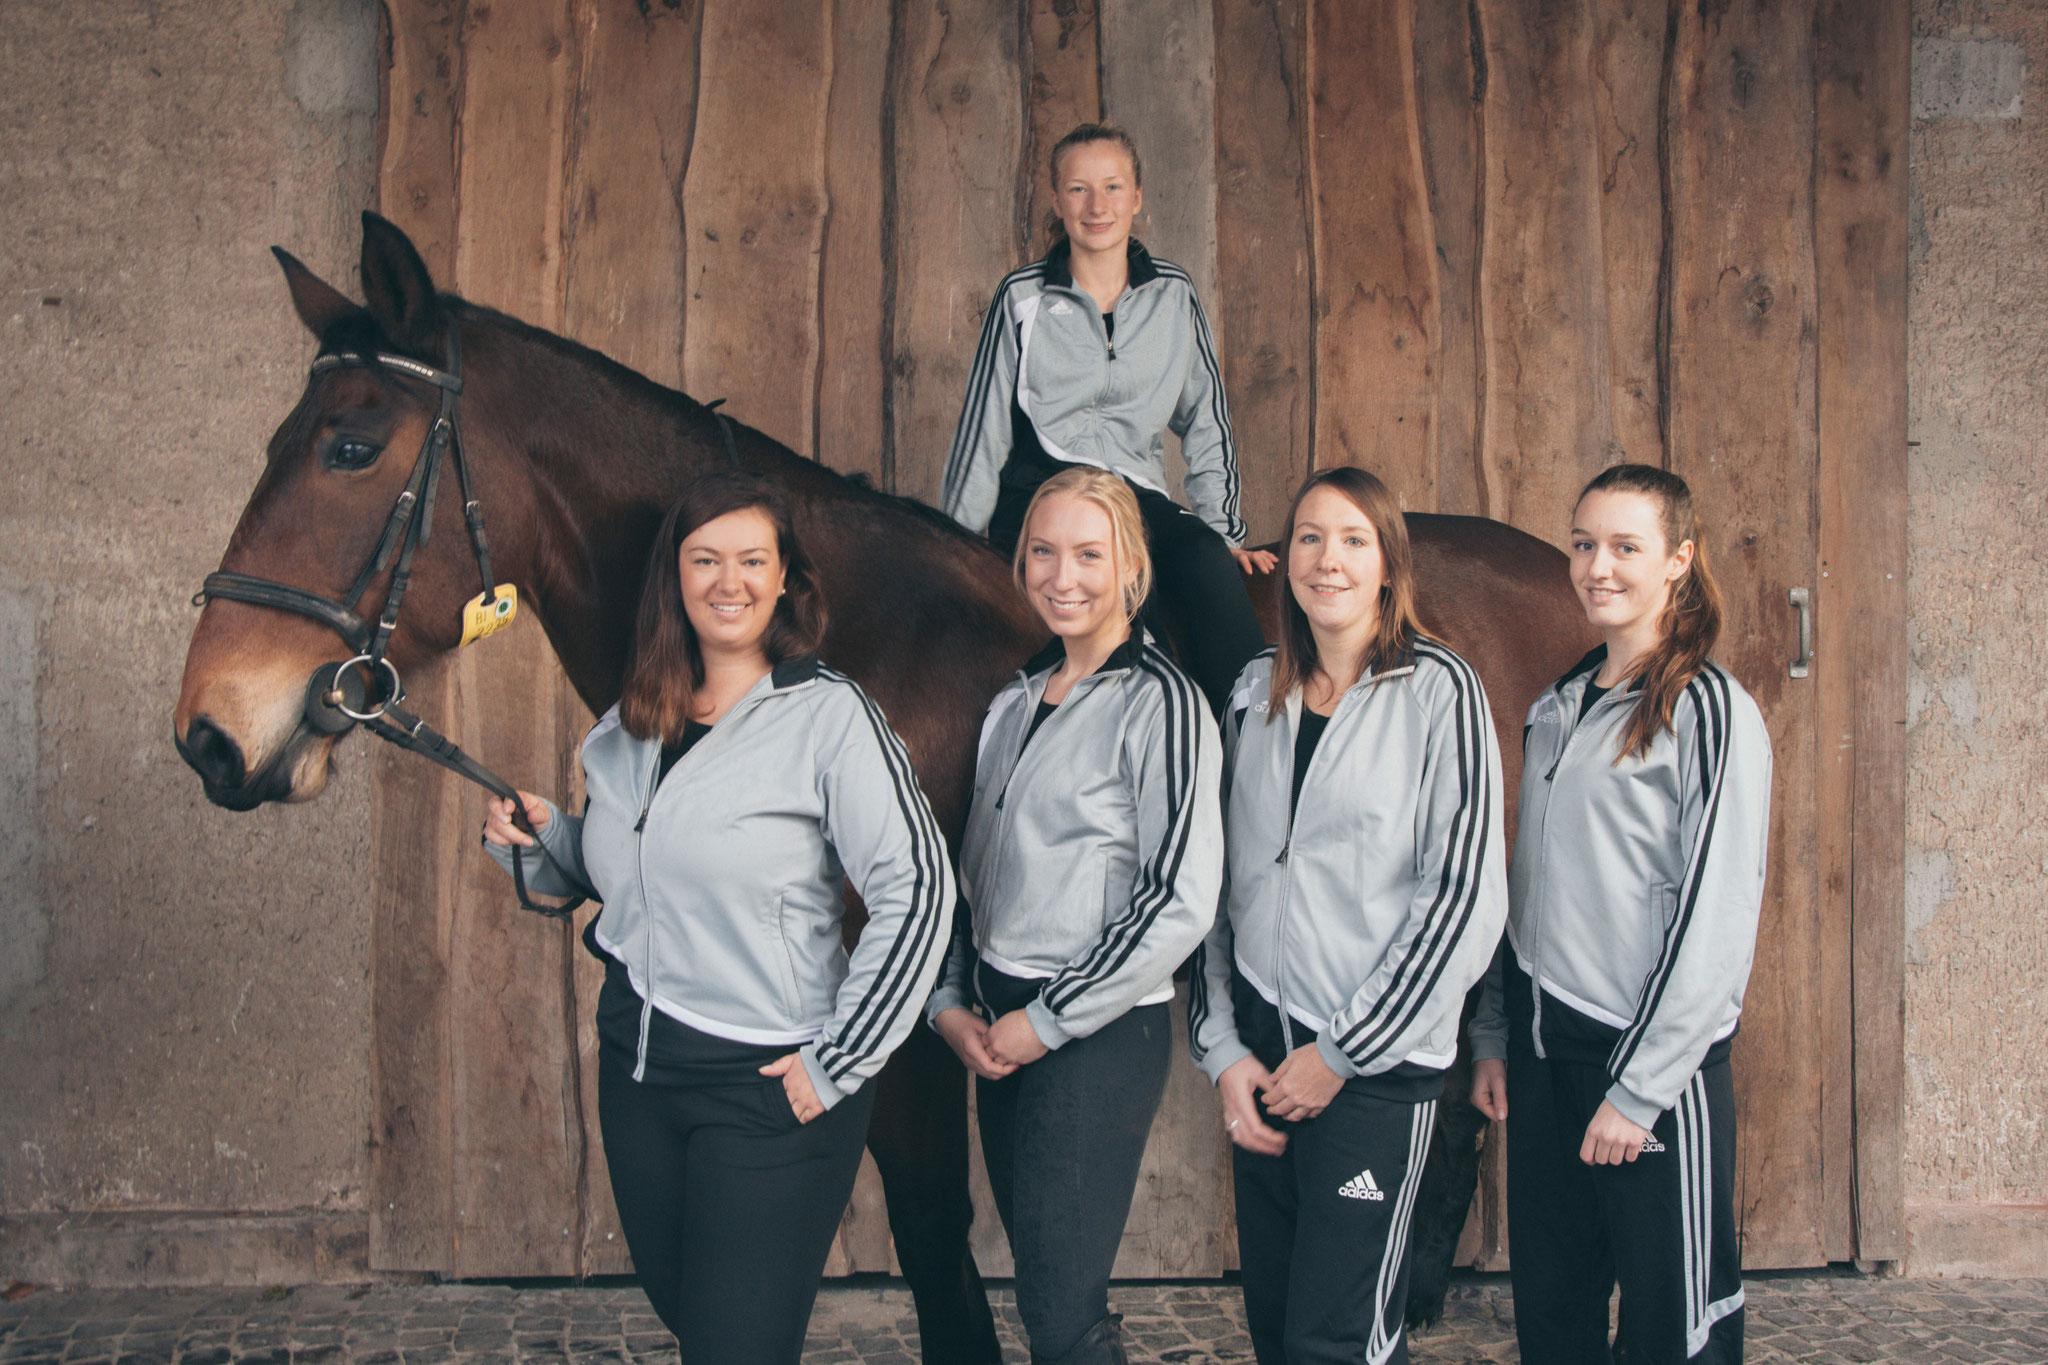 Leni K., Sophia, Michelle, Charlotte und Ronja | Es fehlen: Janna und Leni W.